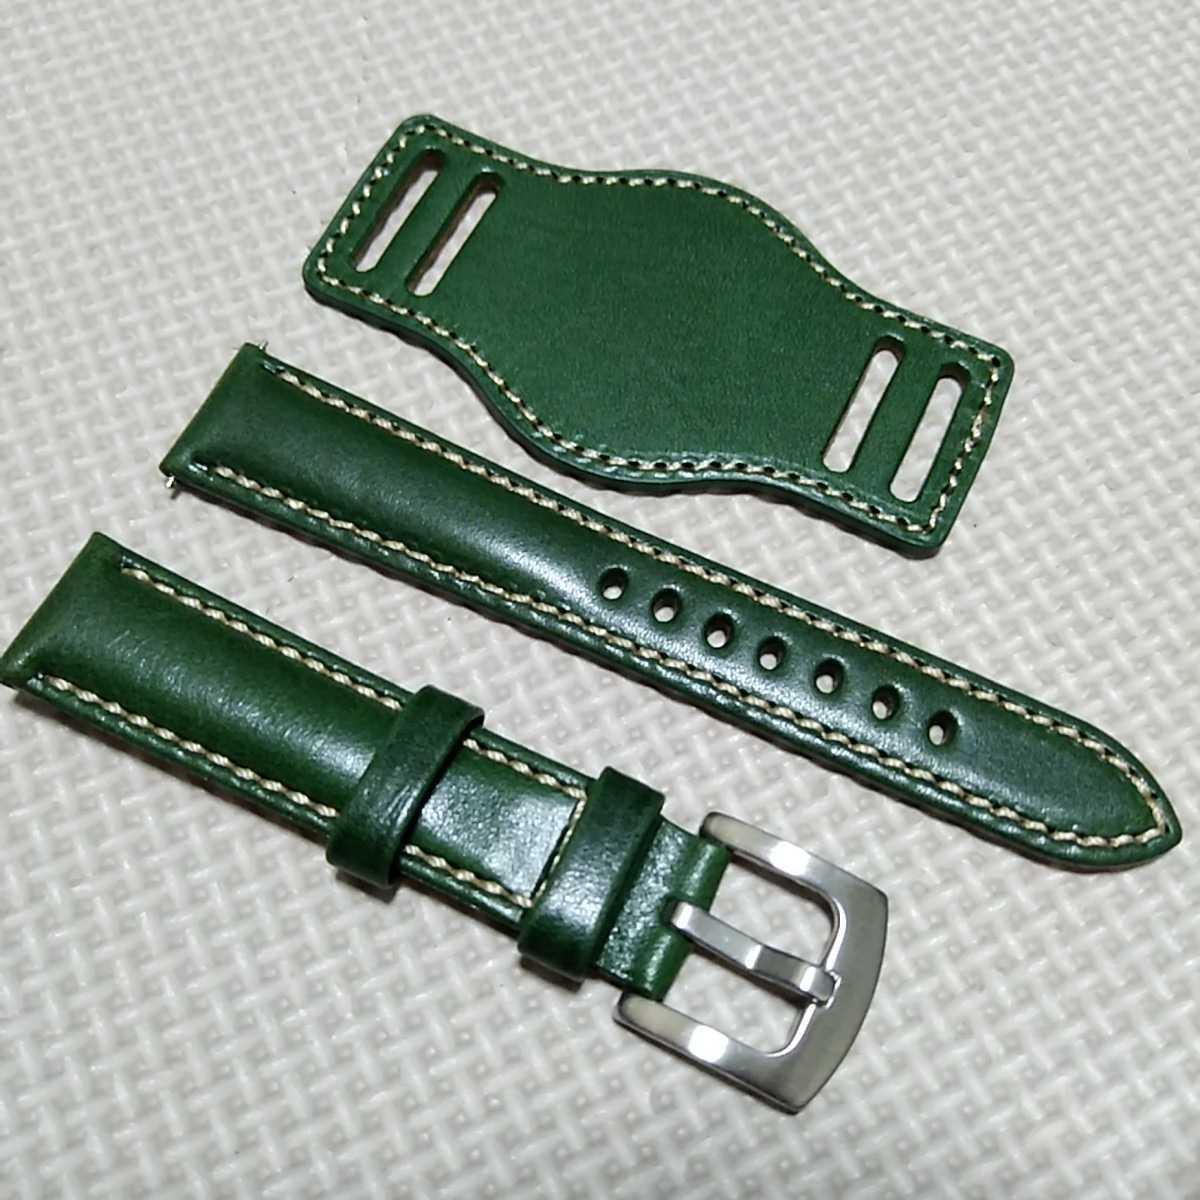 No52 ブンド BUND 本革レザーベルト 腕時計ベルト 交換用ストラップ グリーン 18mm 未使用 高品質 ドイツパイロット 空軍_画像1